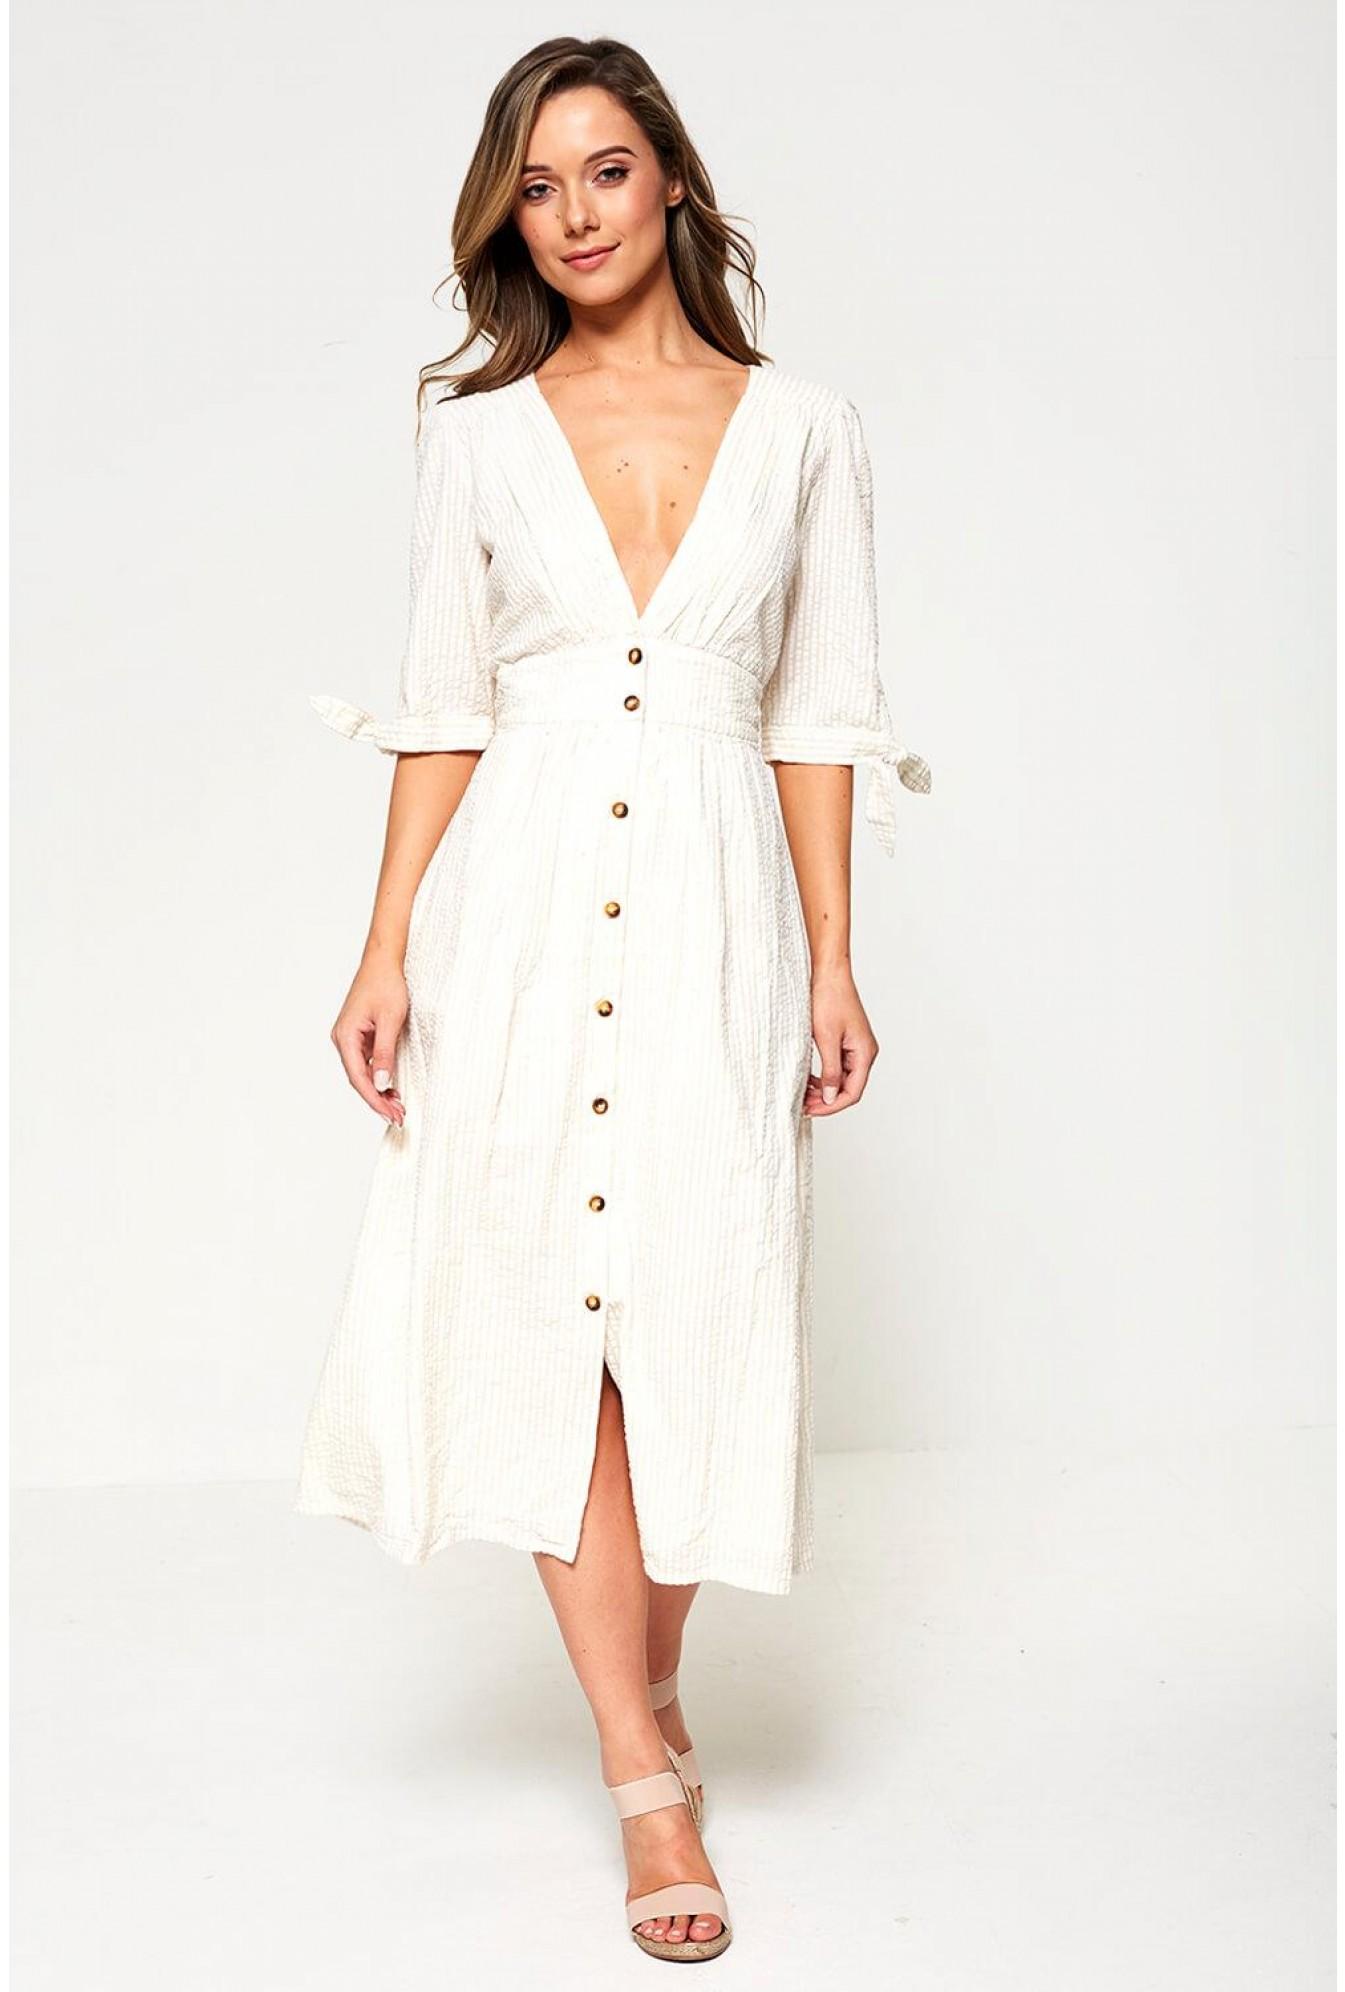 incredible prices sale uk best cheap Vero Moda Stripe Button Through Midi Dress in Light Beige | iCLOTHING